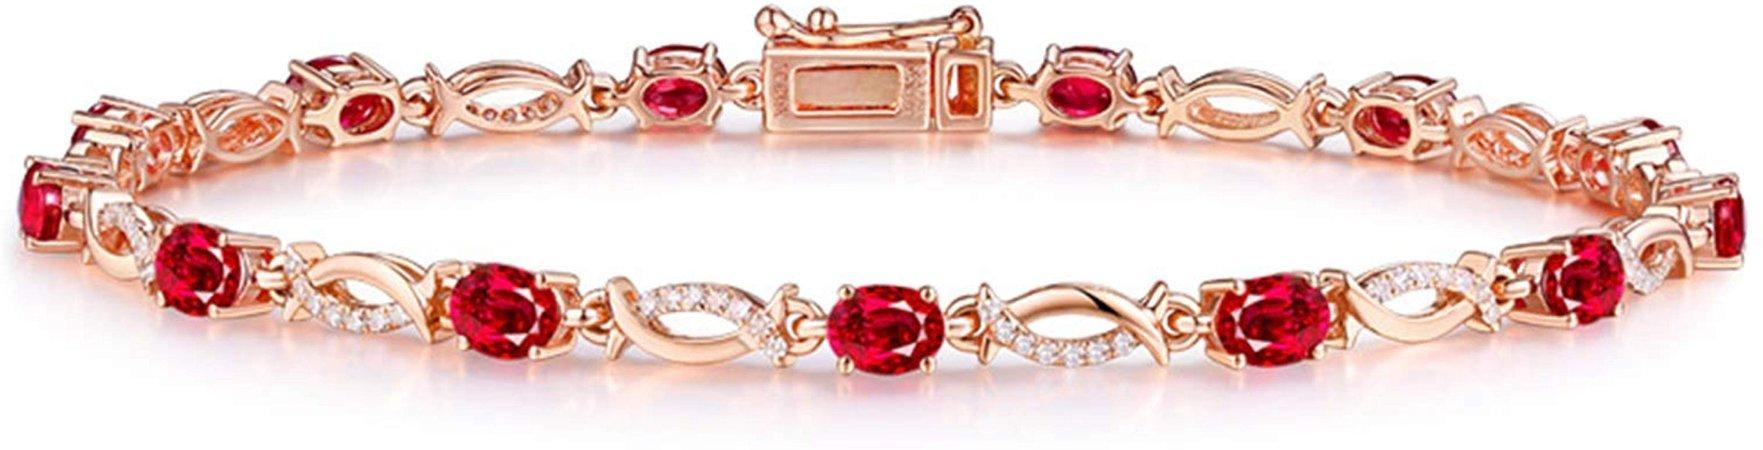 Rubis bracelet